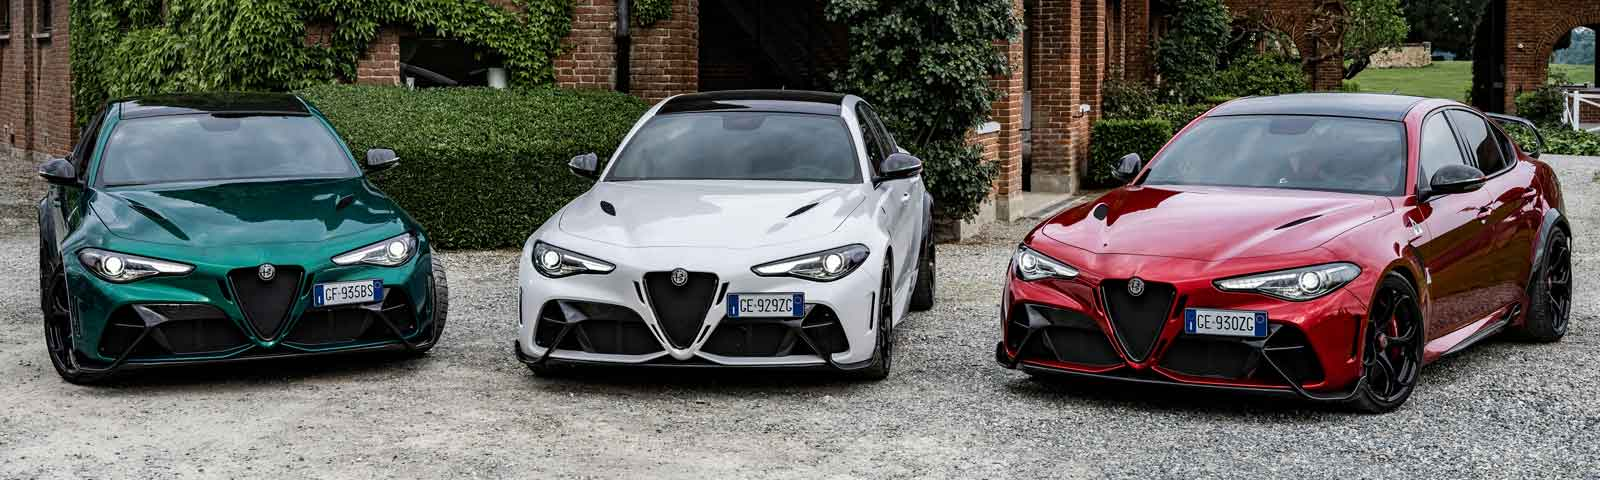 Präsentation des Alfa Romeo GTA